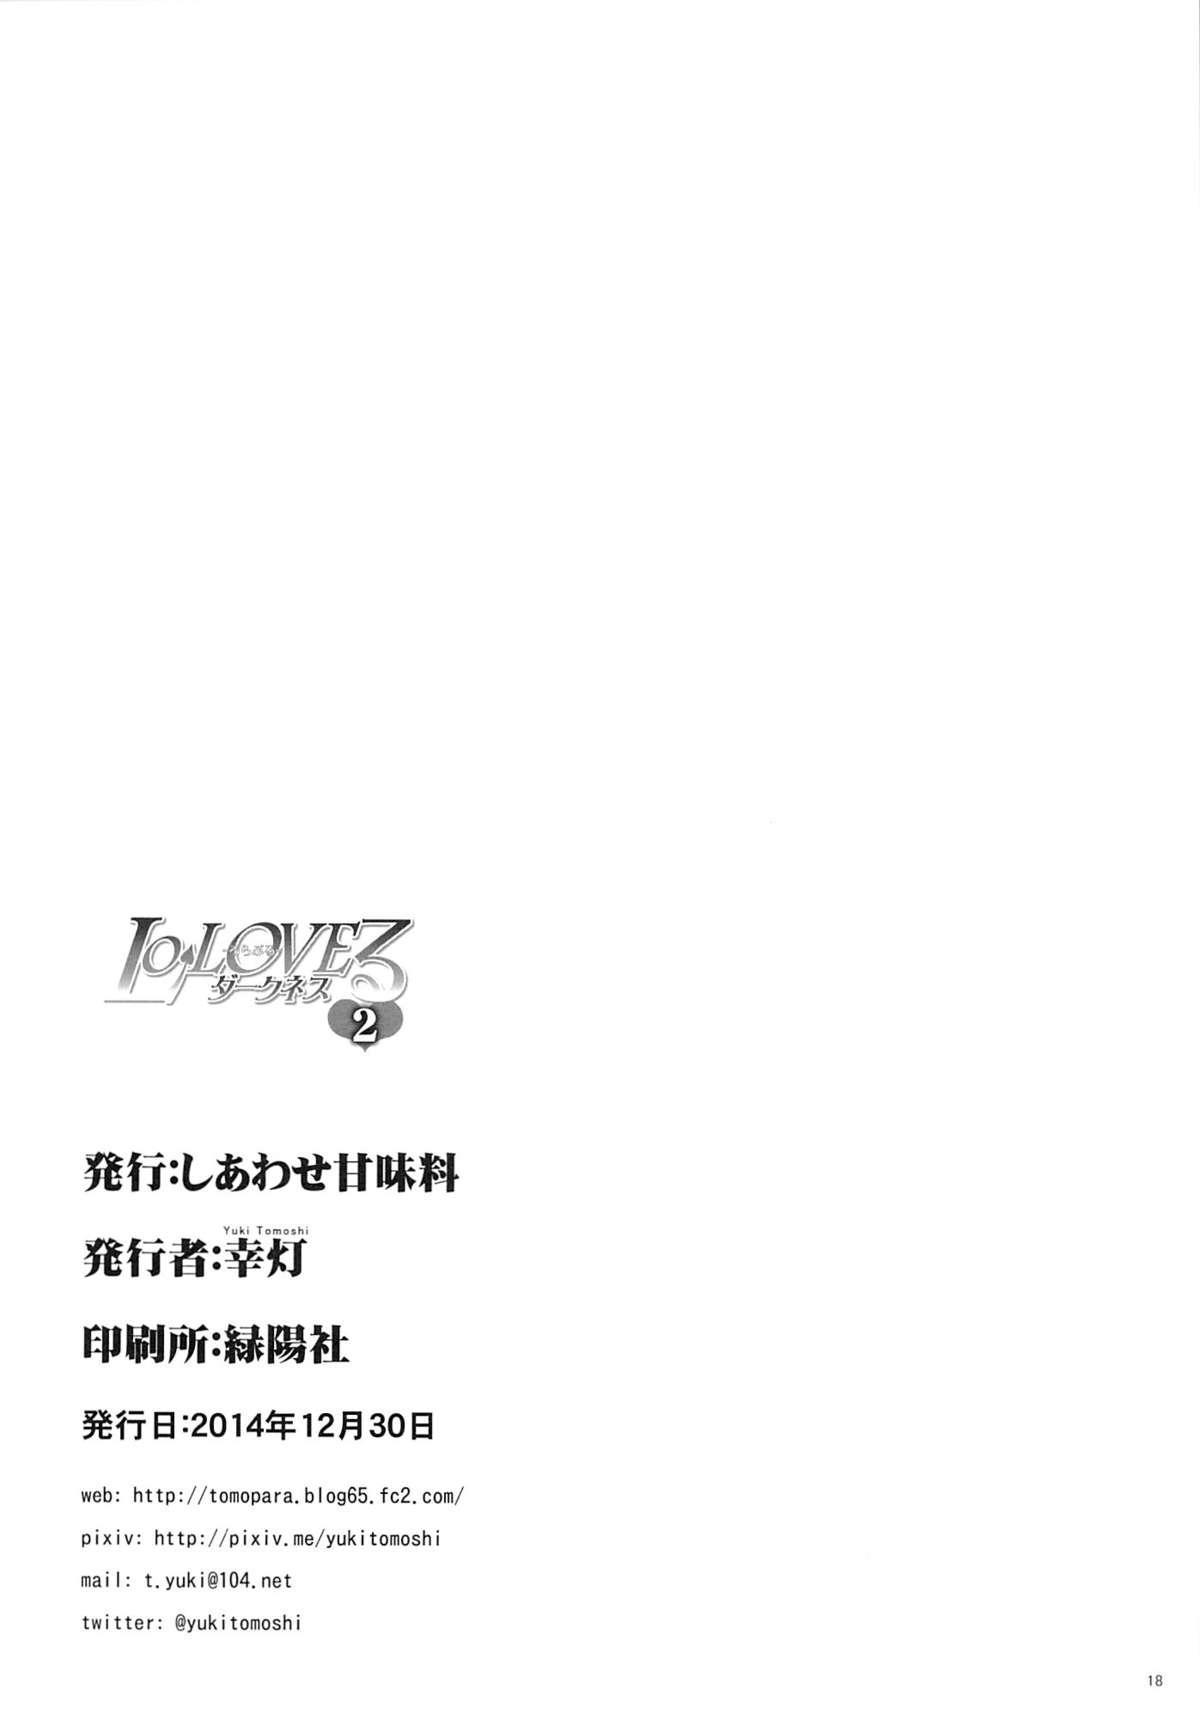 LoLOVE-Ru Darkness 2 16